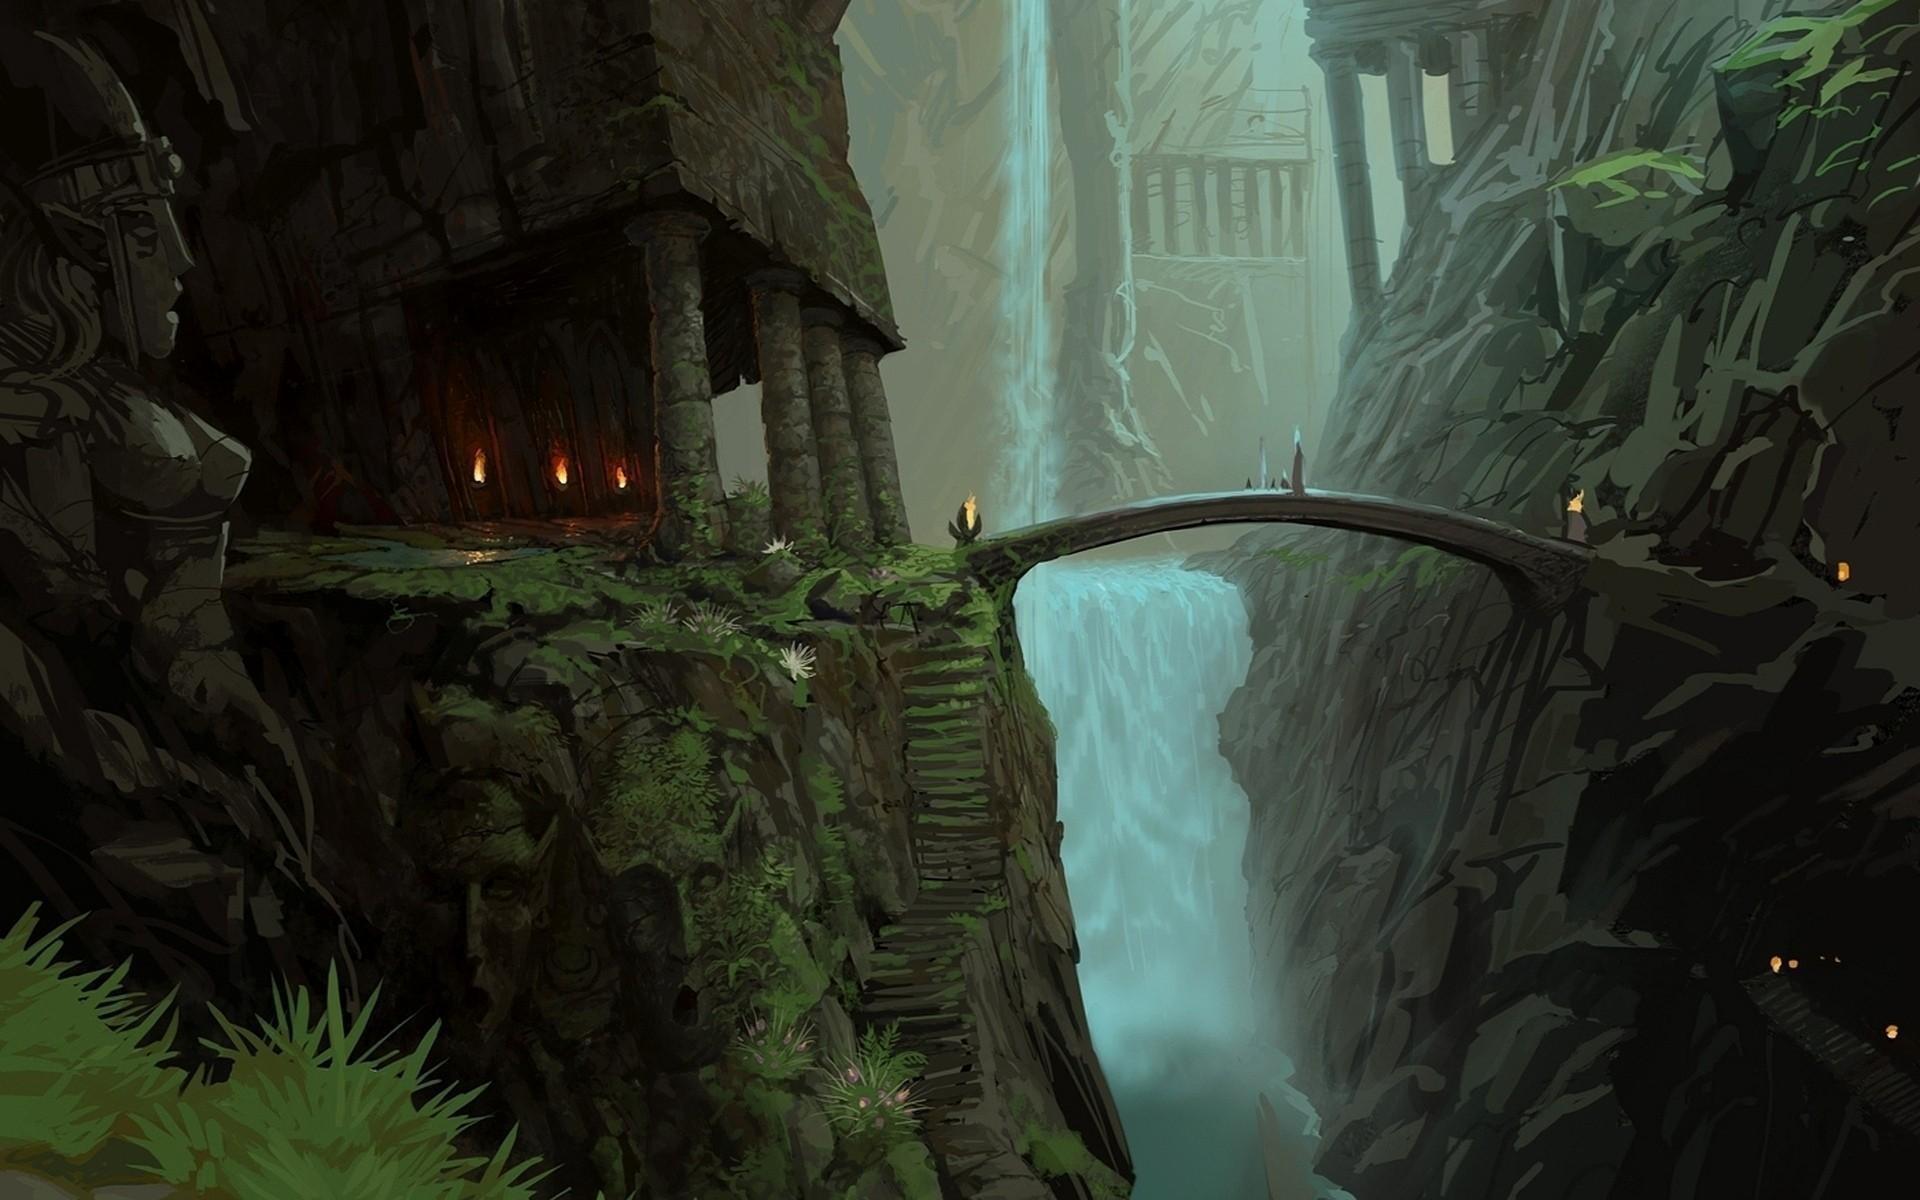 Lord of the rings iphone wallpaper 74 images - Fantasy wallpaper bridge ...